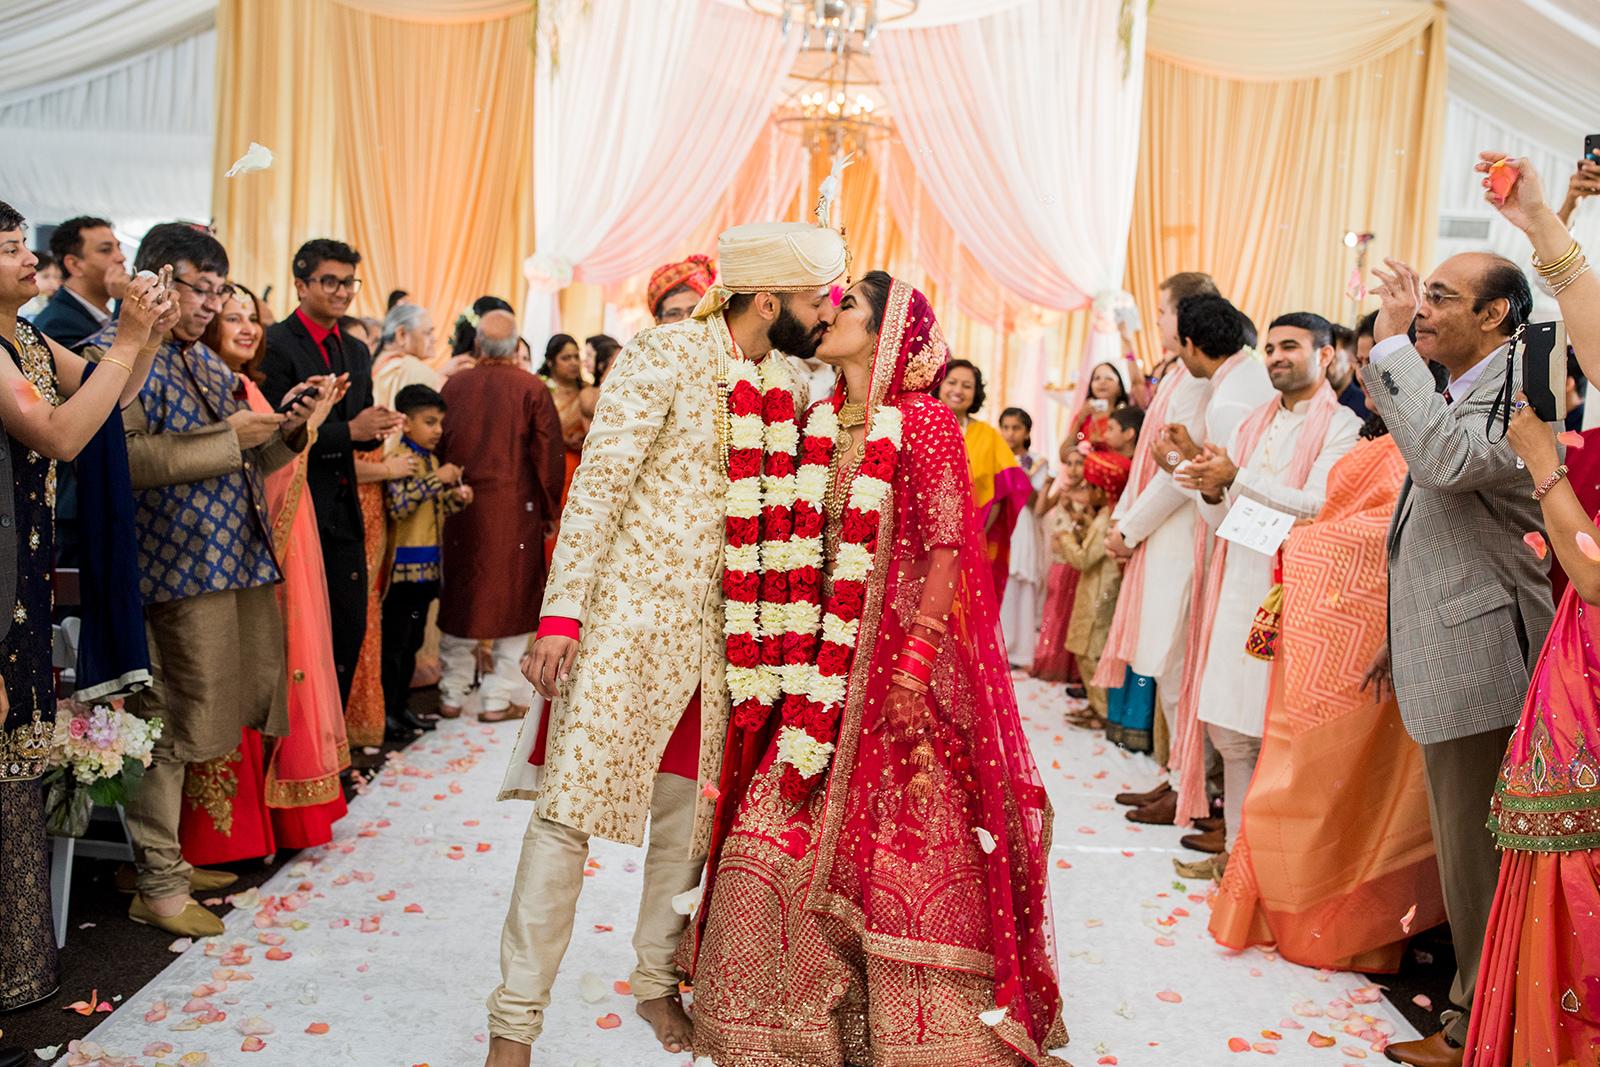 Le Cape Weddings - Sumeet and Chavi - Ceremony --102.jpg